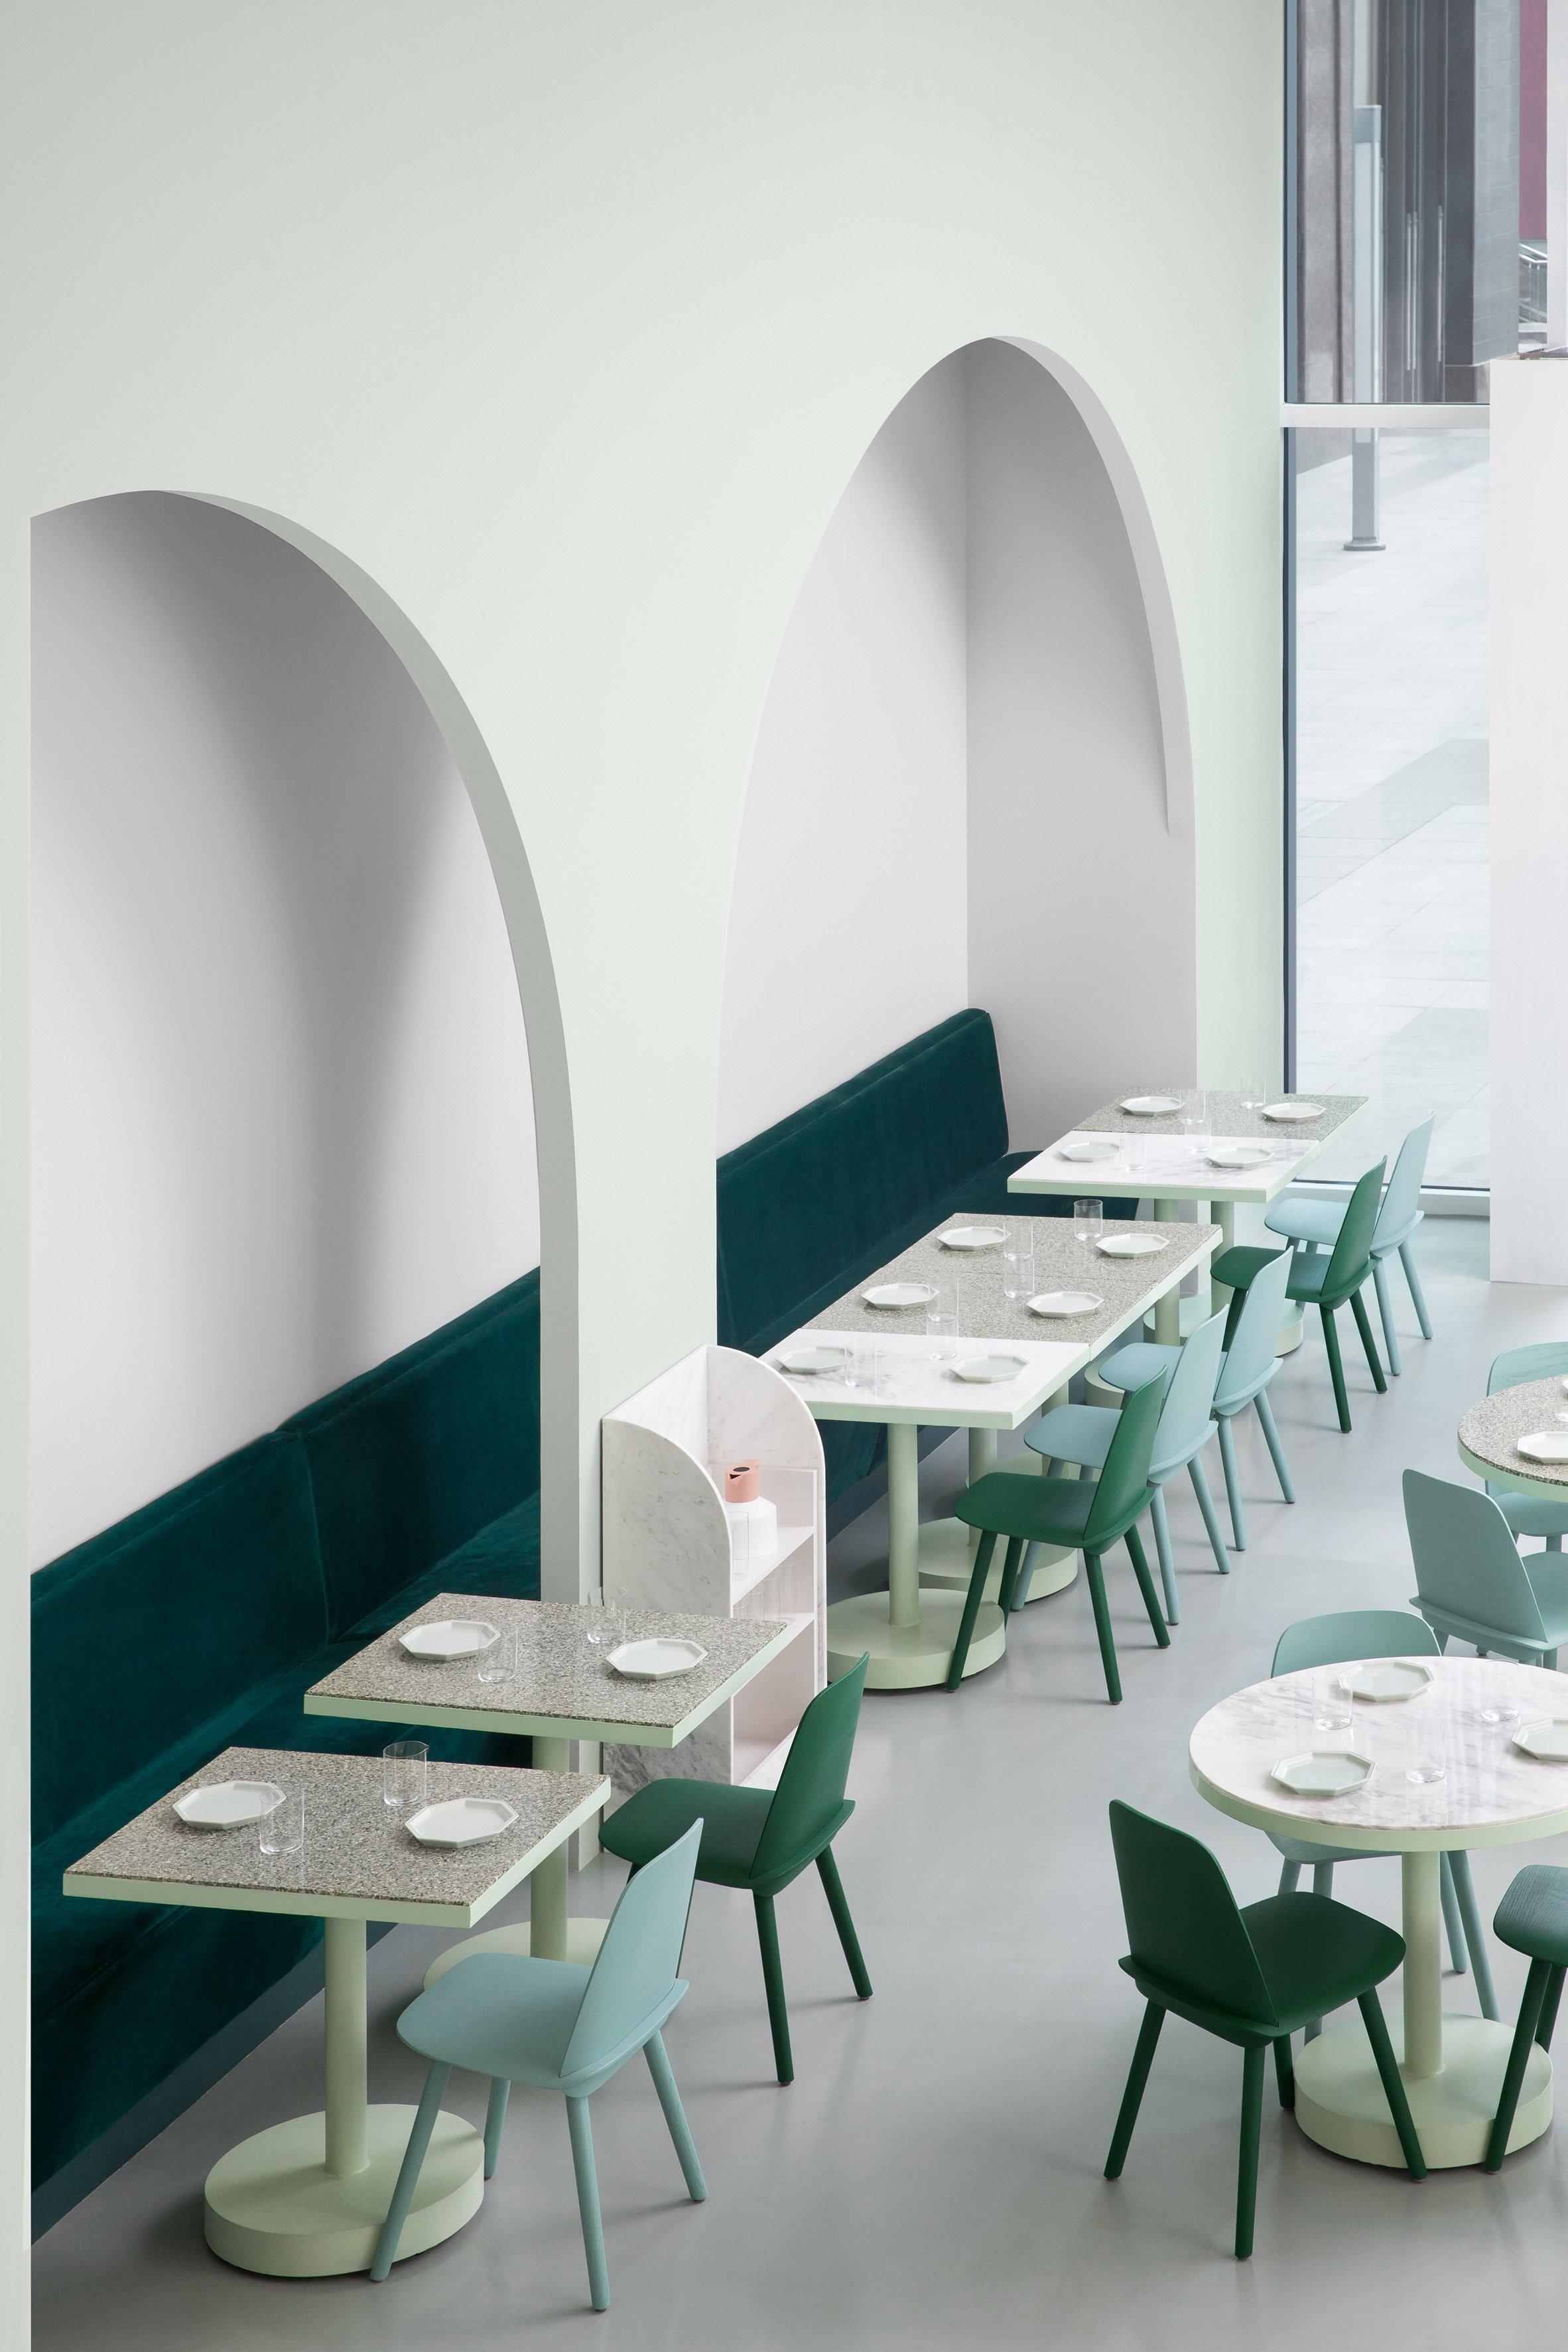 budapest-cafe-6.jpg